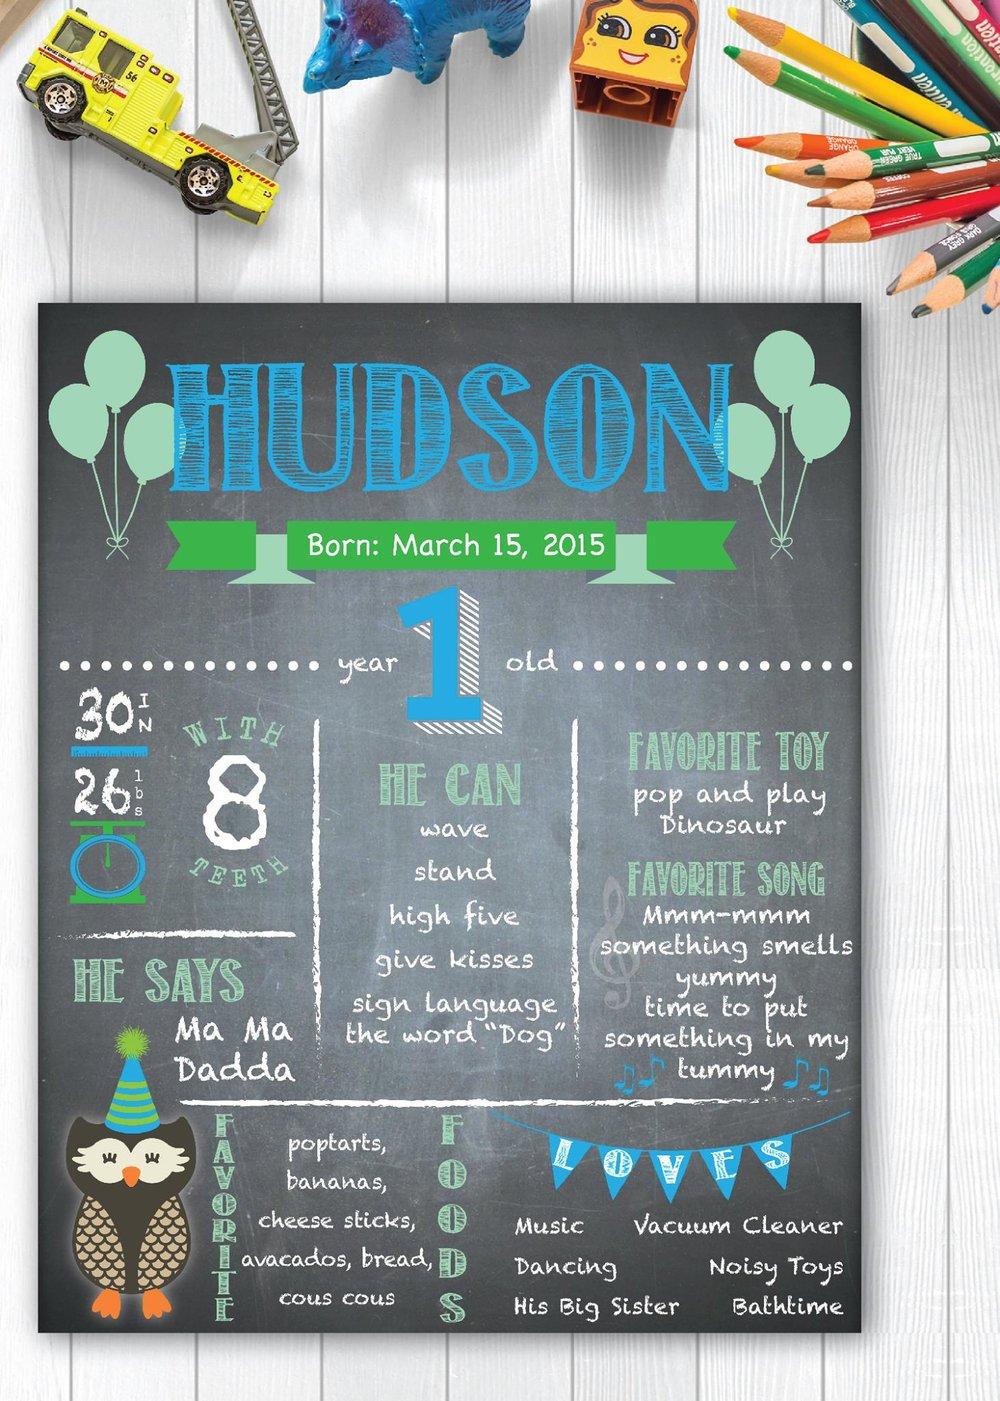 jsd hudson birthday board.jpg